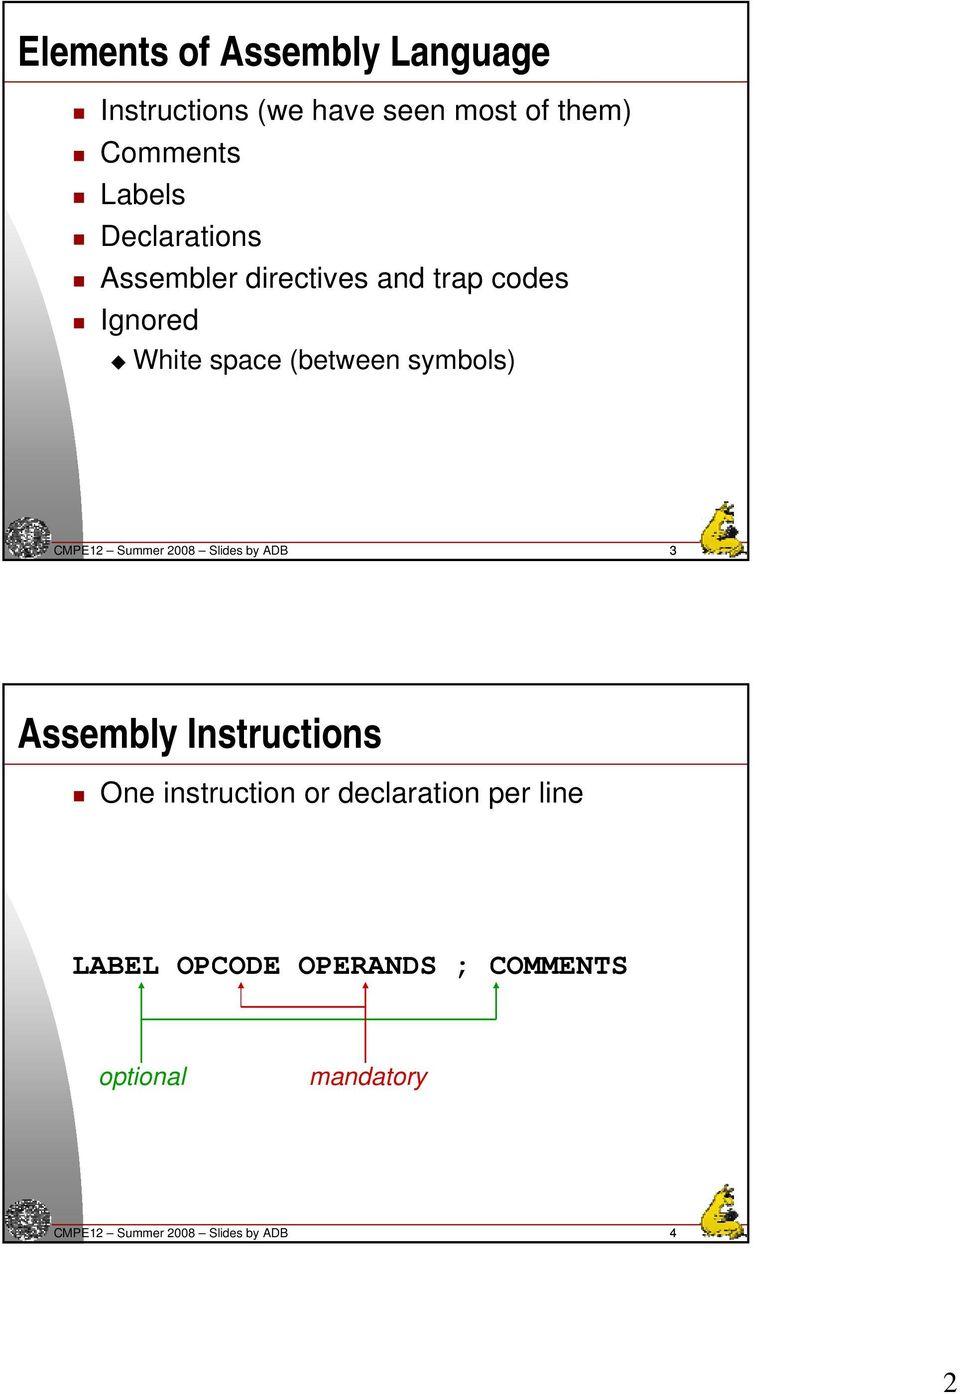 assembly language go to instruction